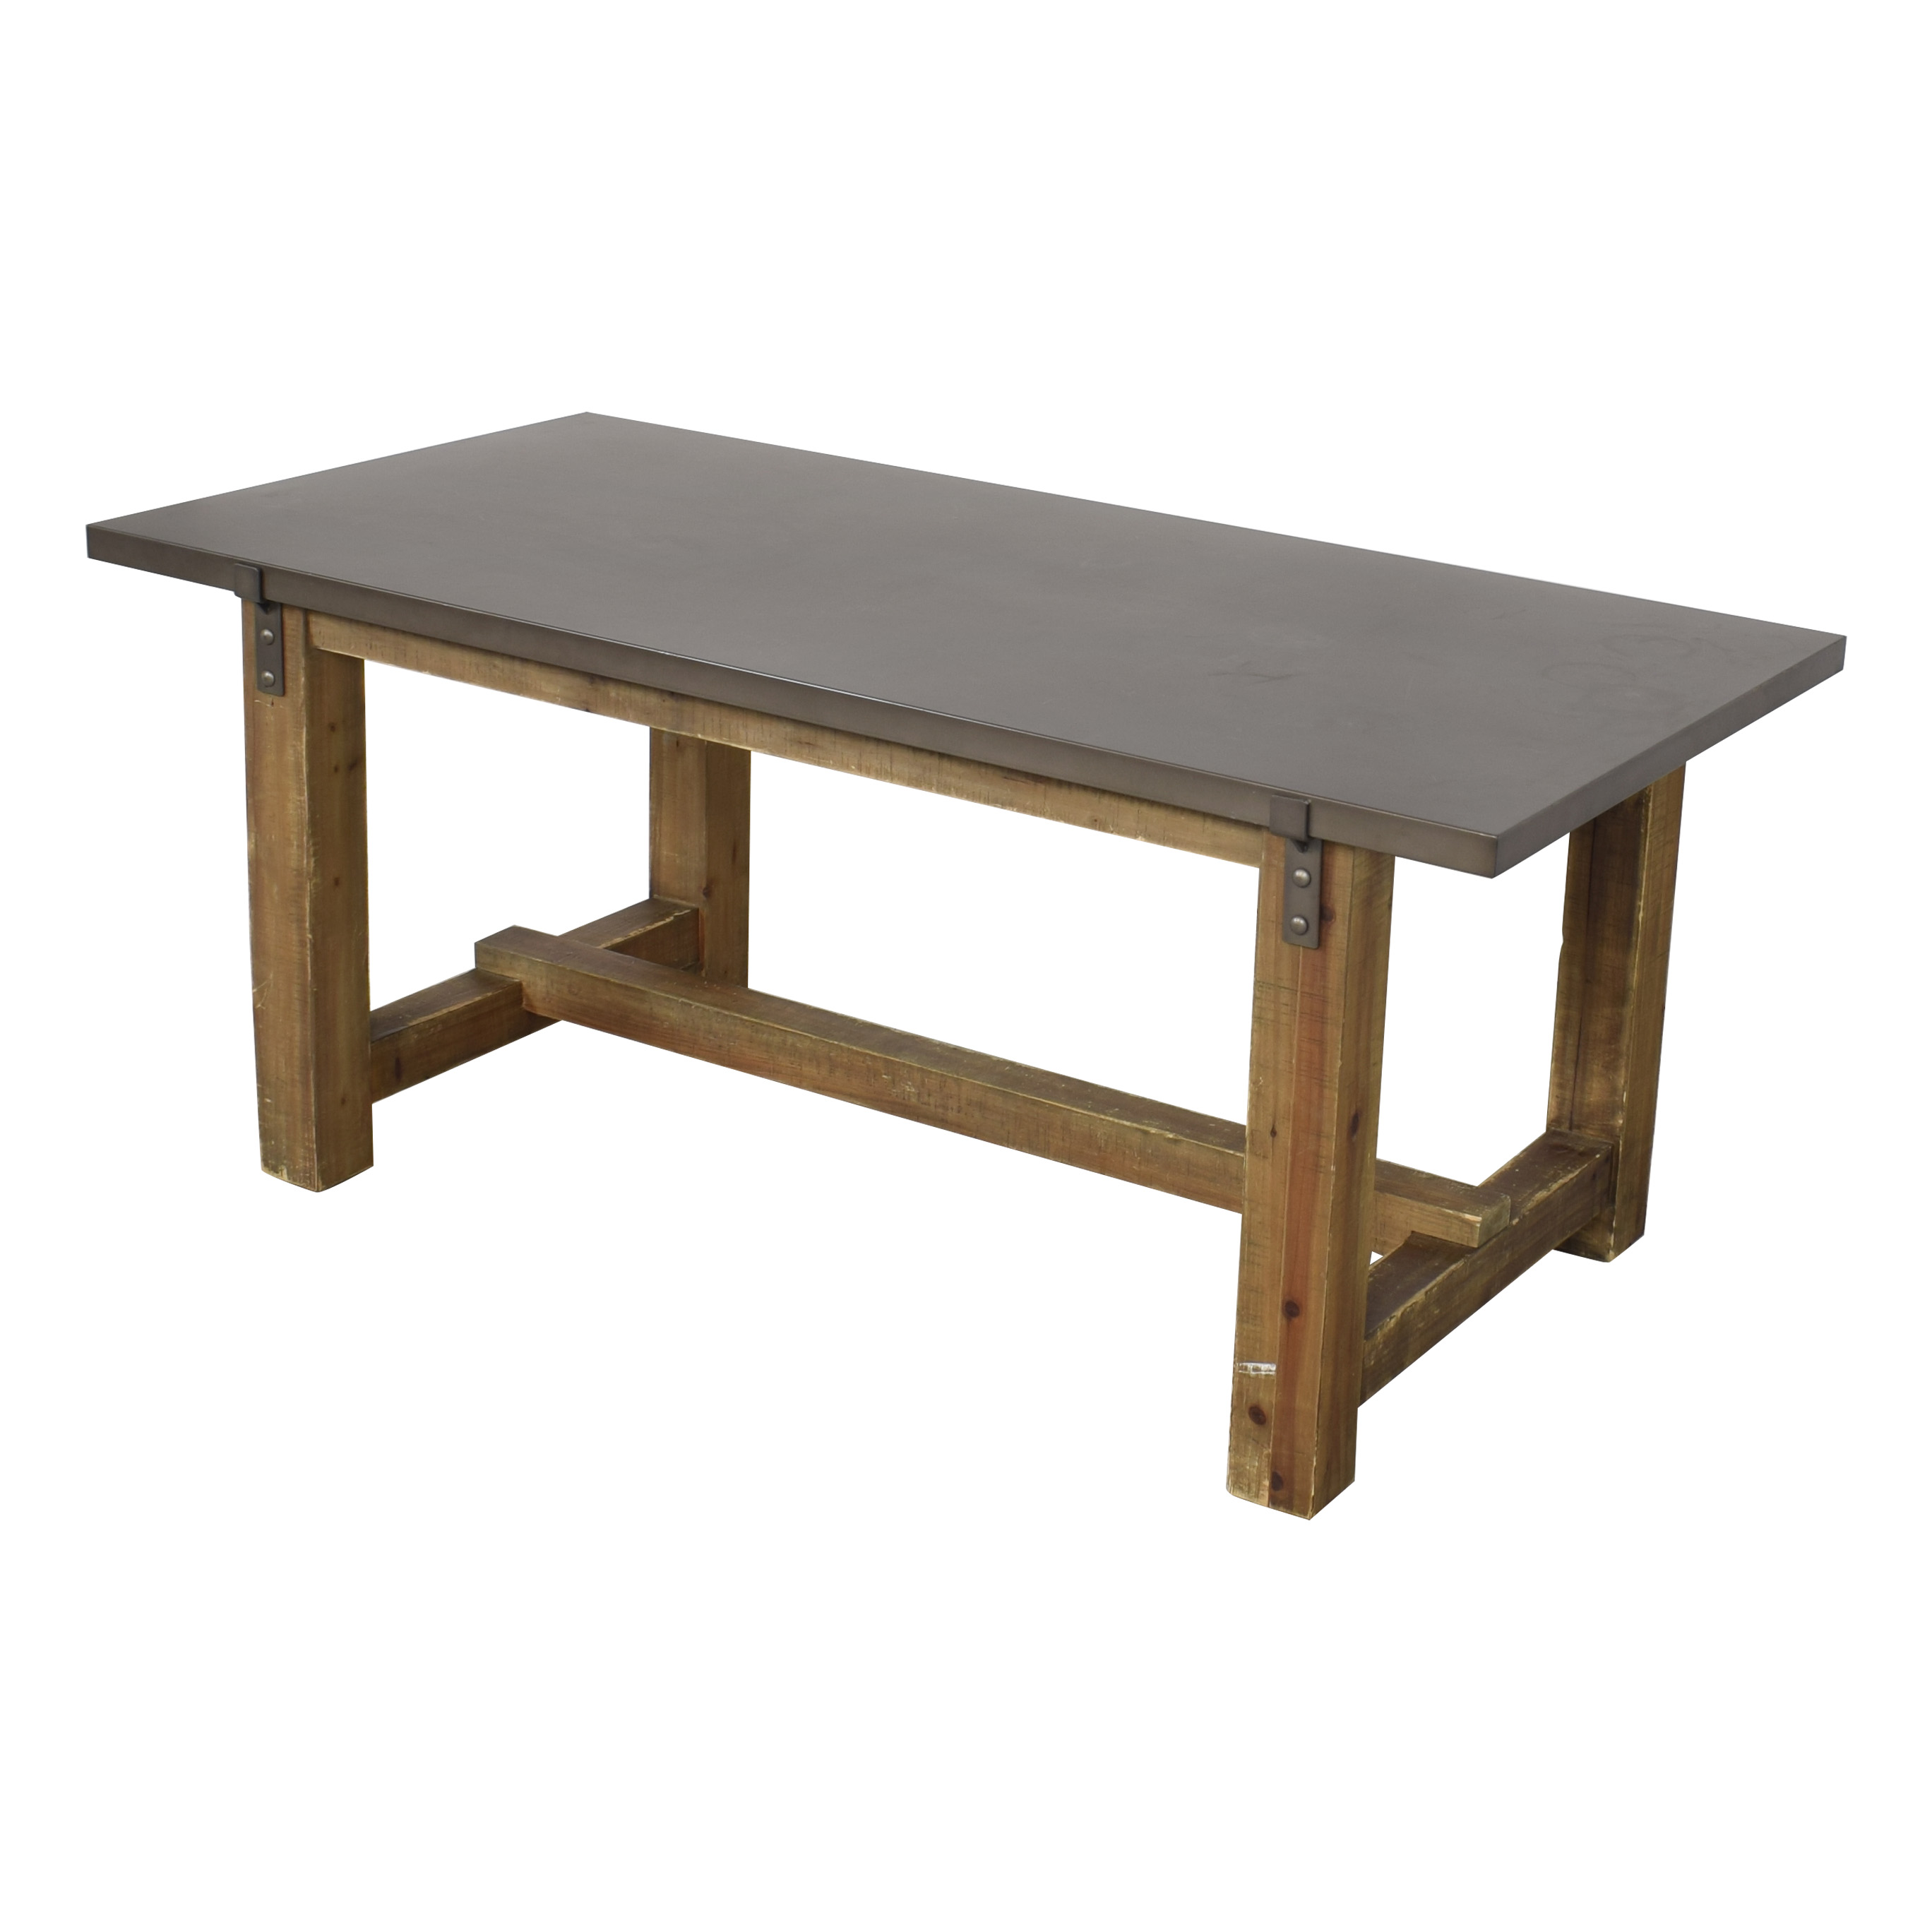 Restoration Hardware Restoration Hardware Reclaimed Wood & Zinc-Top Rectangular Dining Table second hand